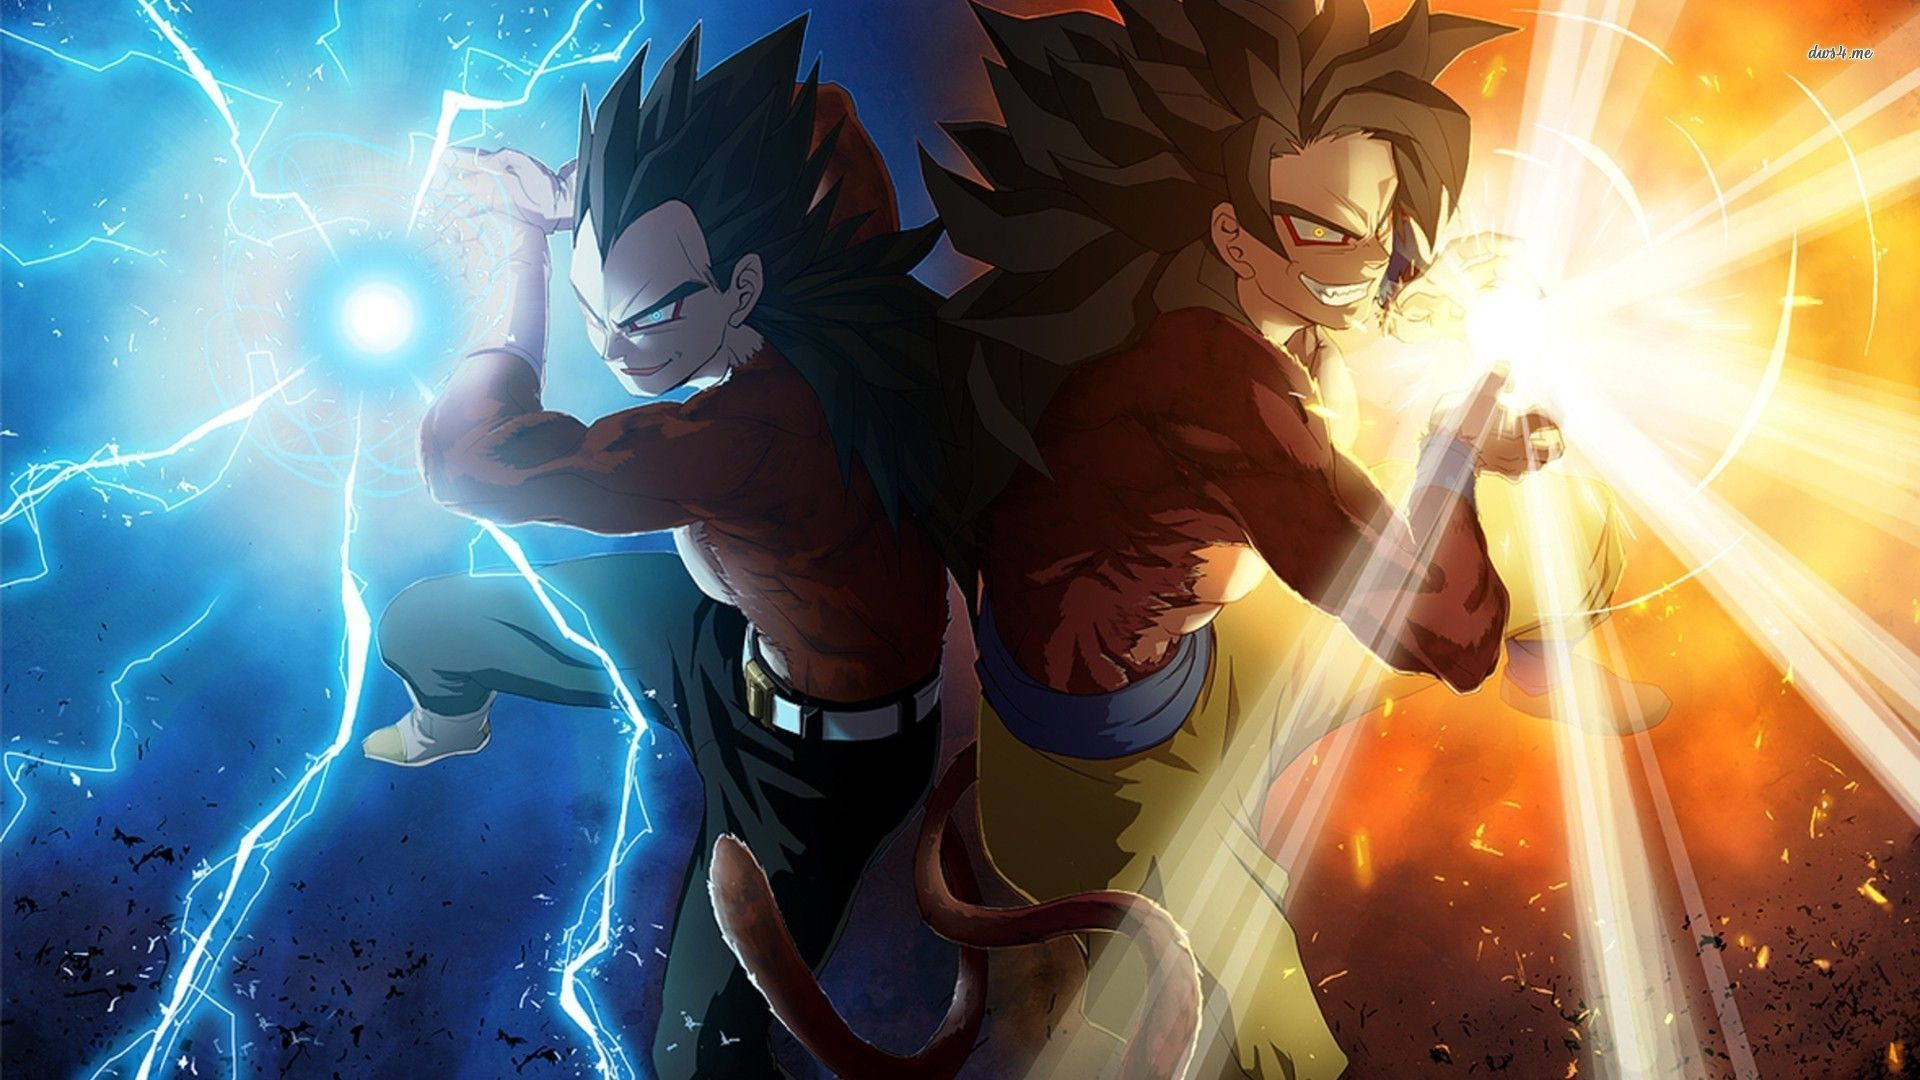 Dragon Ball Z Goku Wallpaper 77 Images